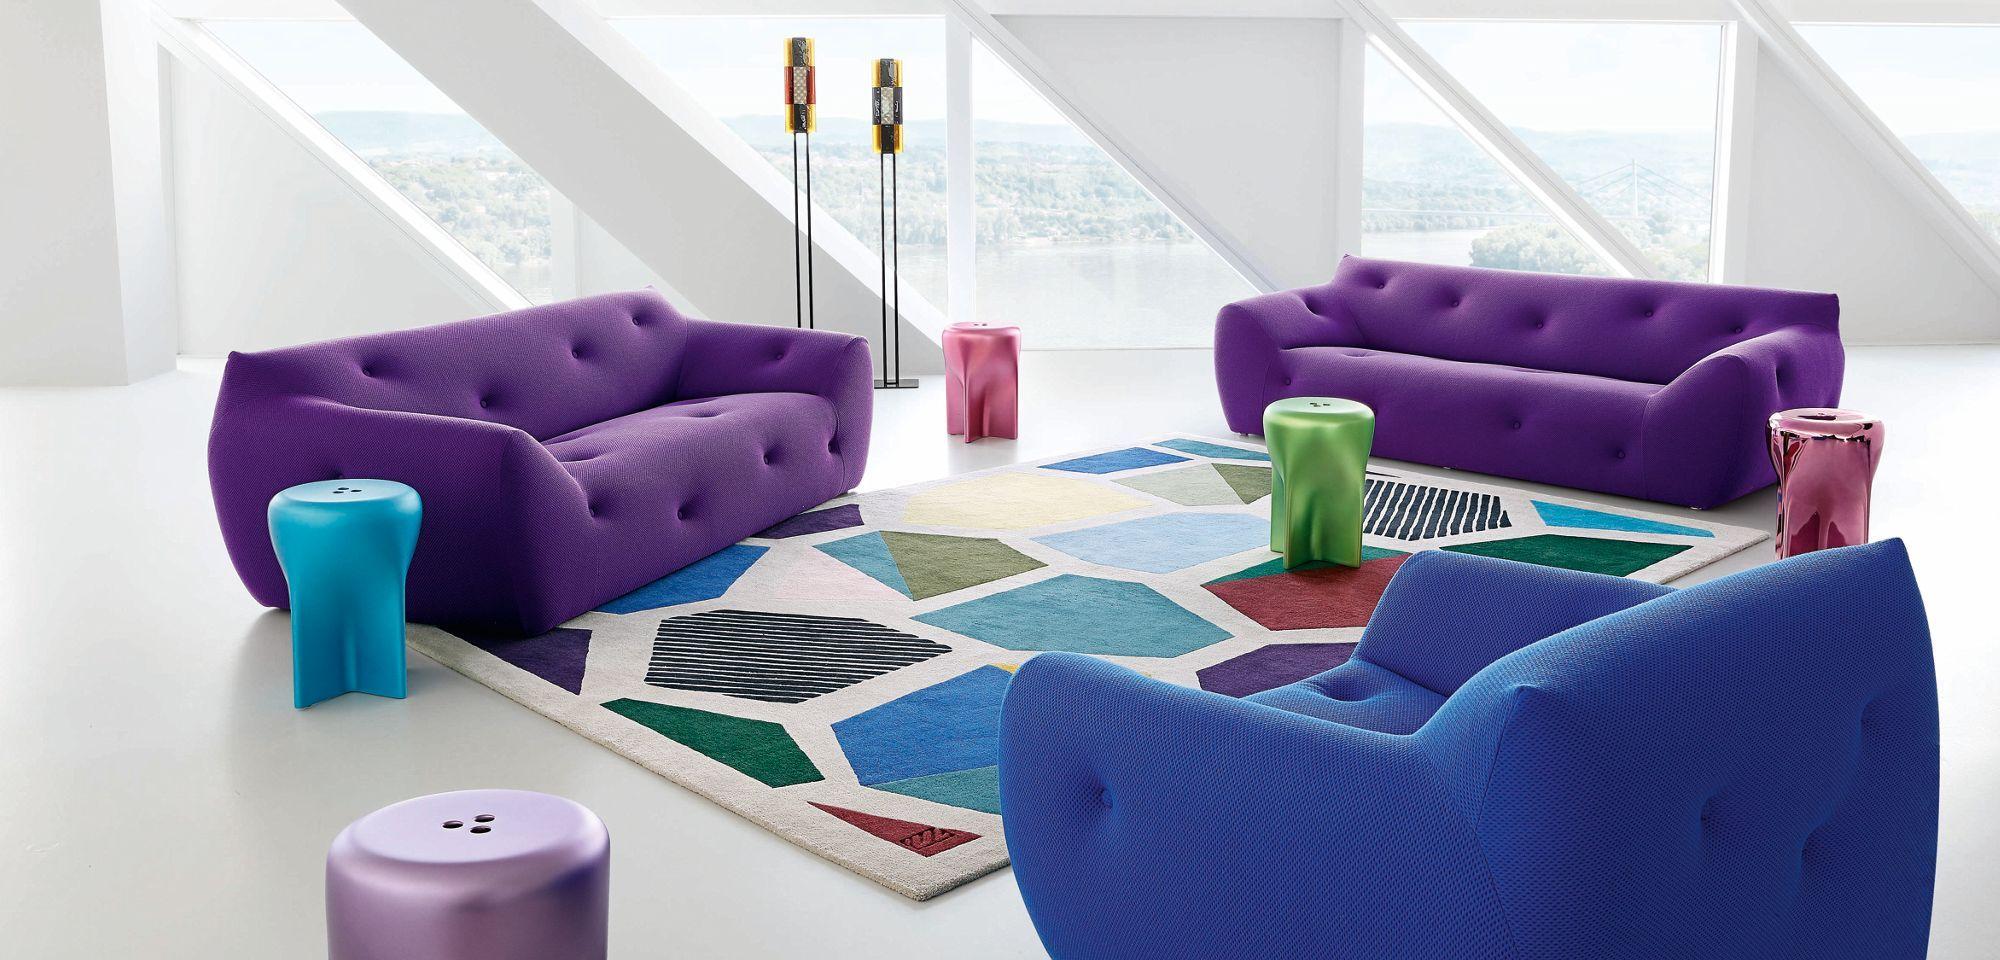 Informel Large 3 Seat Sofa Fabric Sofa Design Fabric Sofa Types Of Sofas